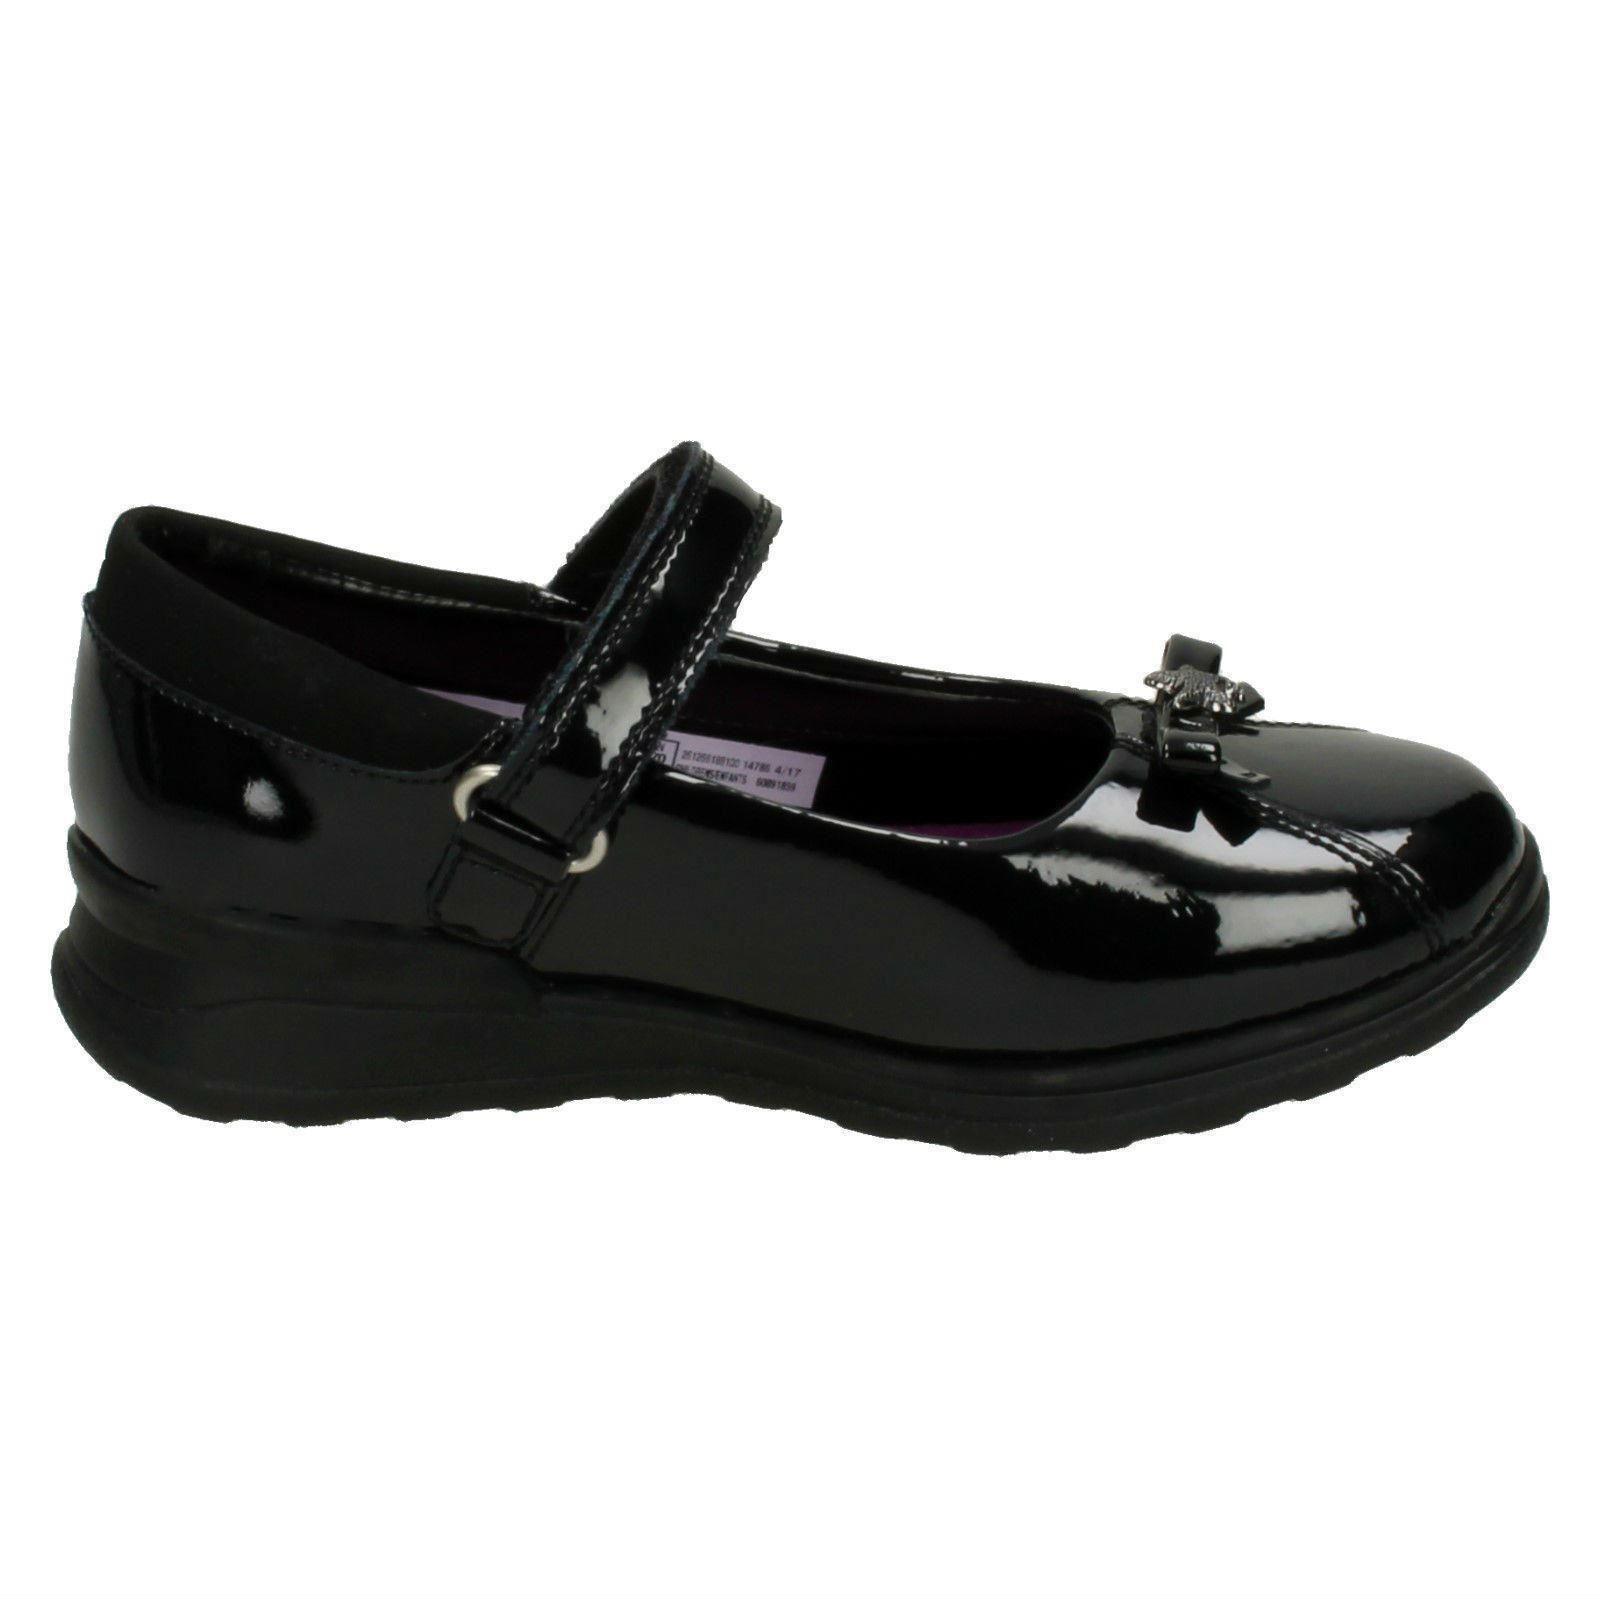 Girls Gloforms By Clarks Bow Trim School Shoes *Mariel Wish Inf*